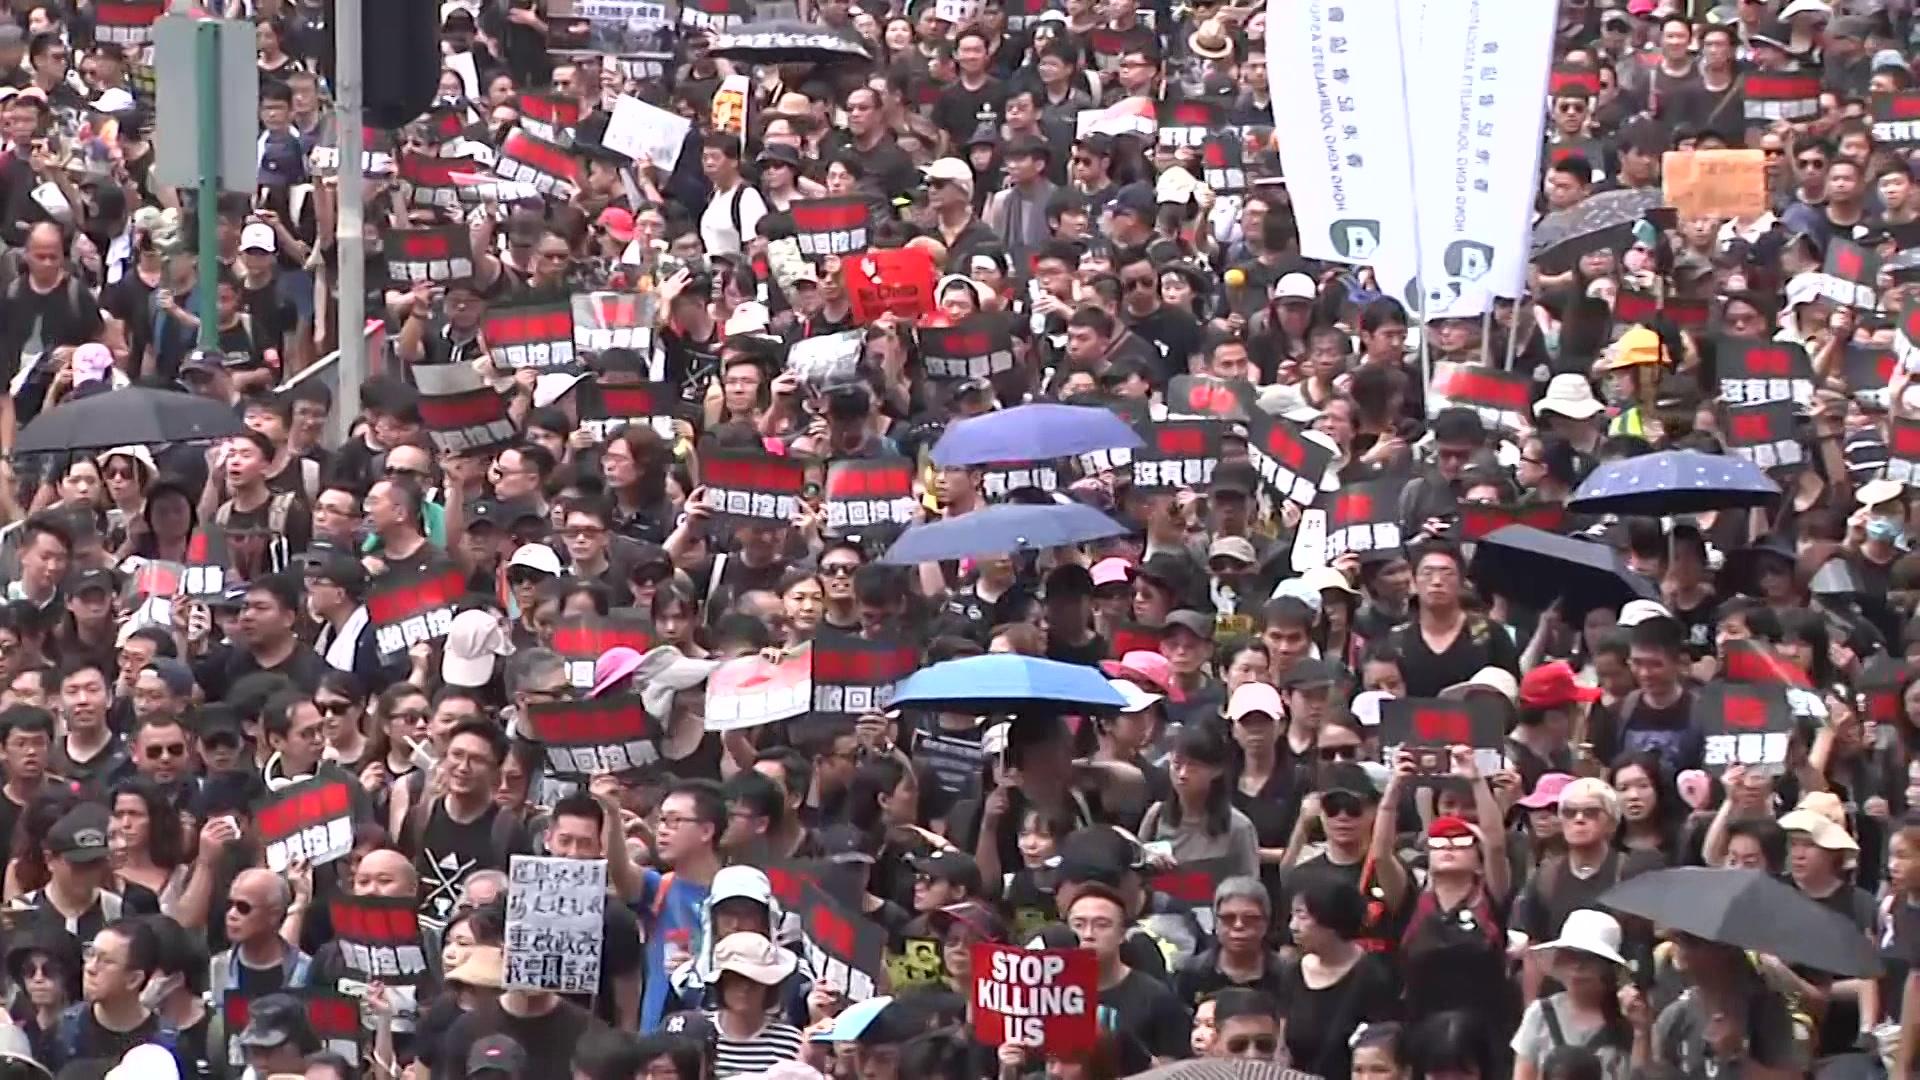 olfr_a_hong_kong_protesters-00.01.14.02.jpg